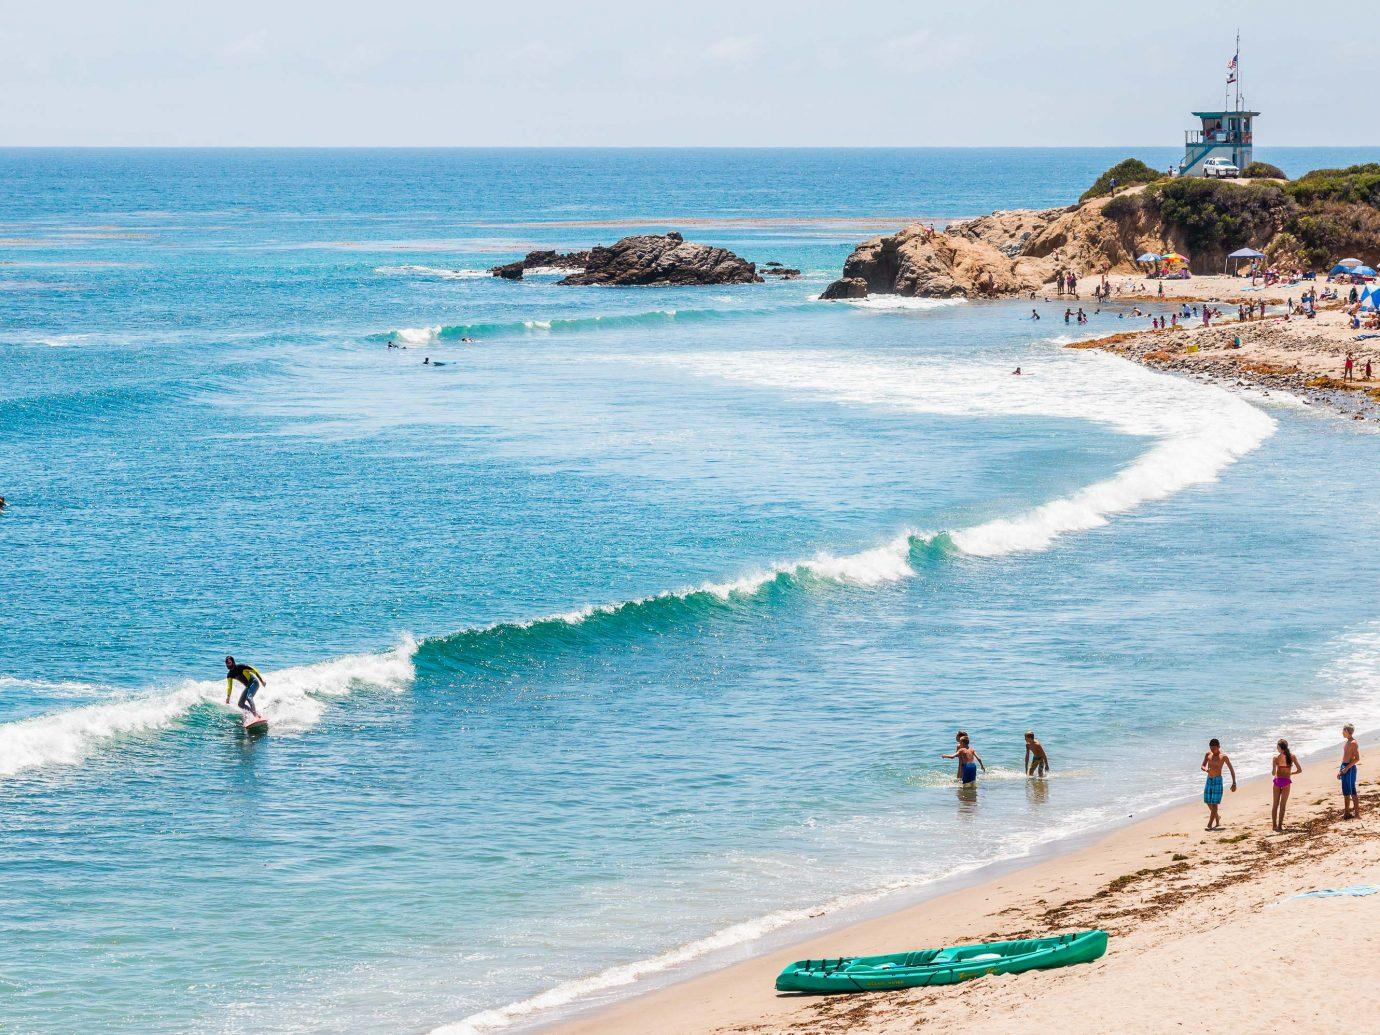 Surfers, swimmers, and sunbathers enjoying the ocean at Leo Carrillo State Beach in Malibu, California.